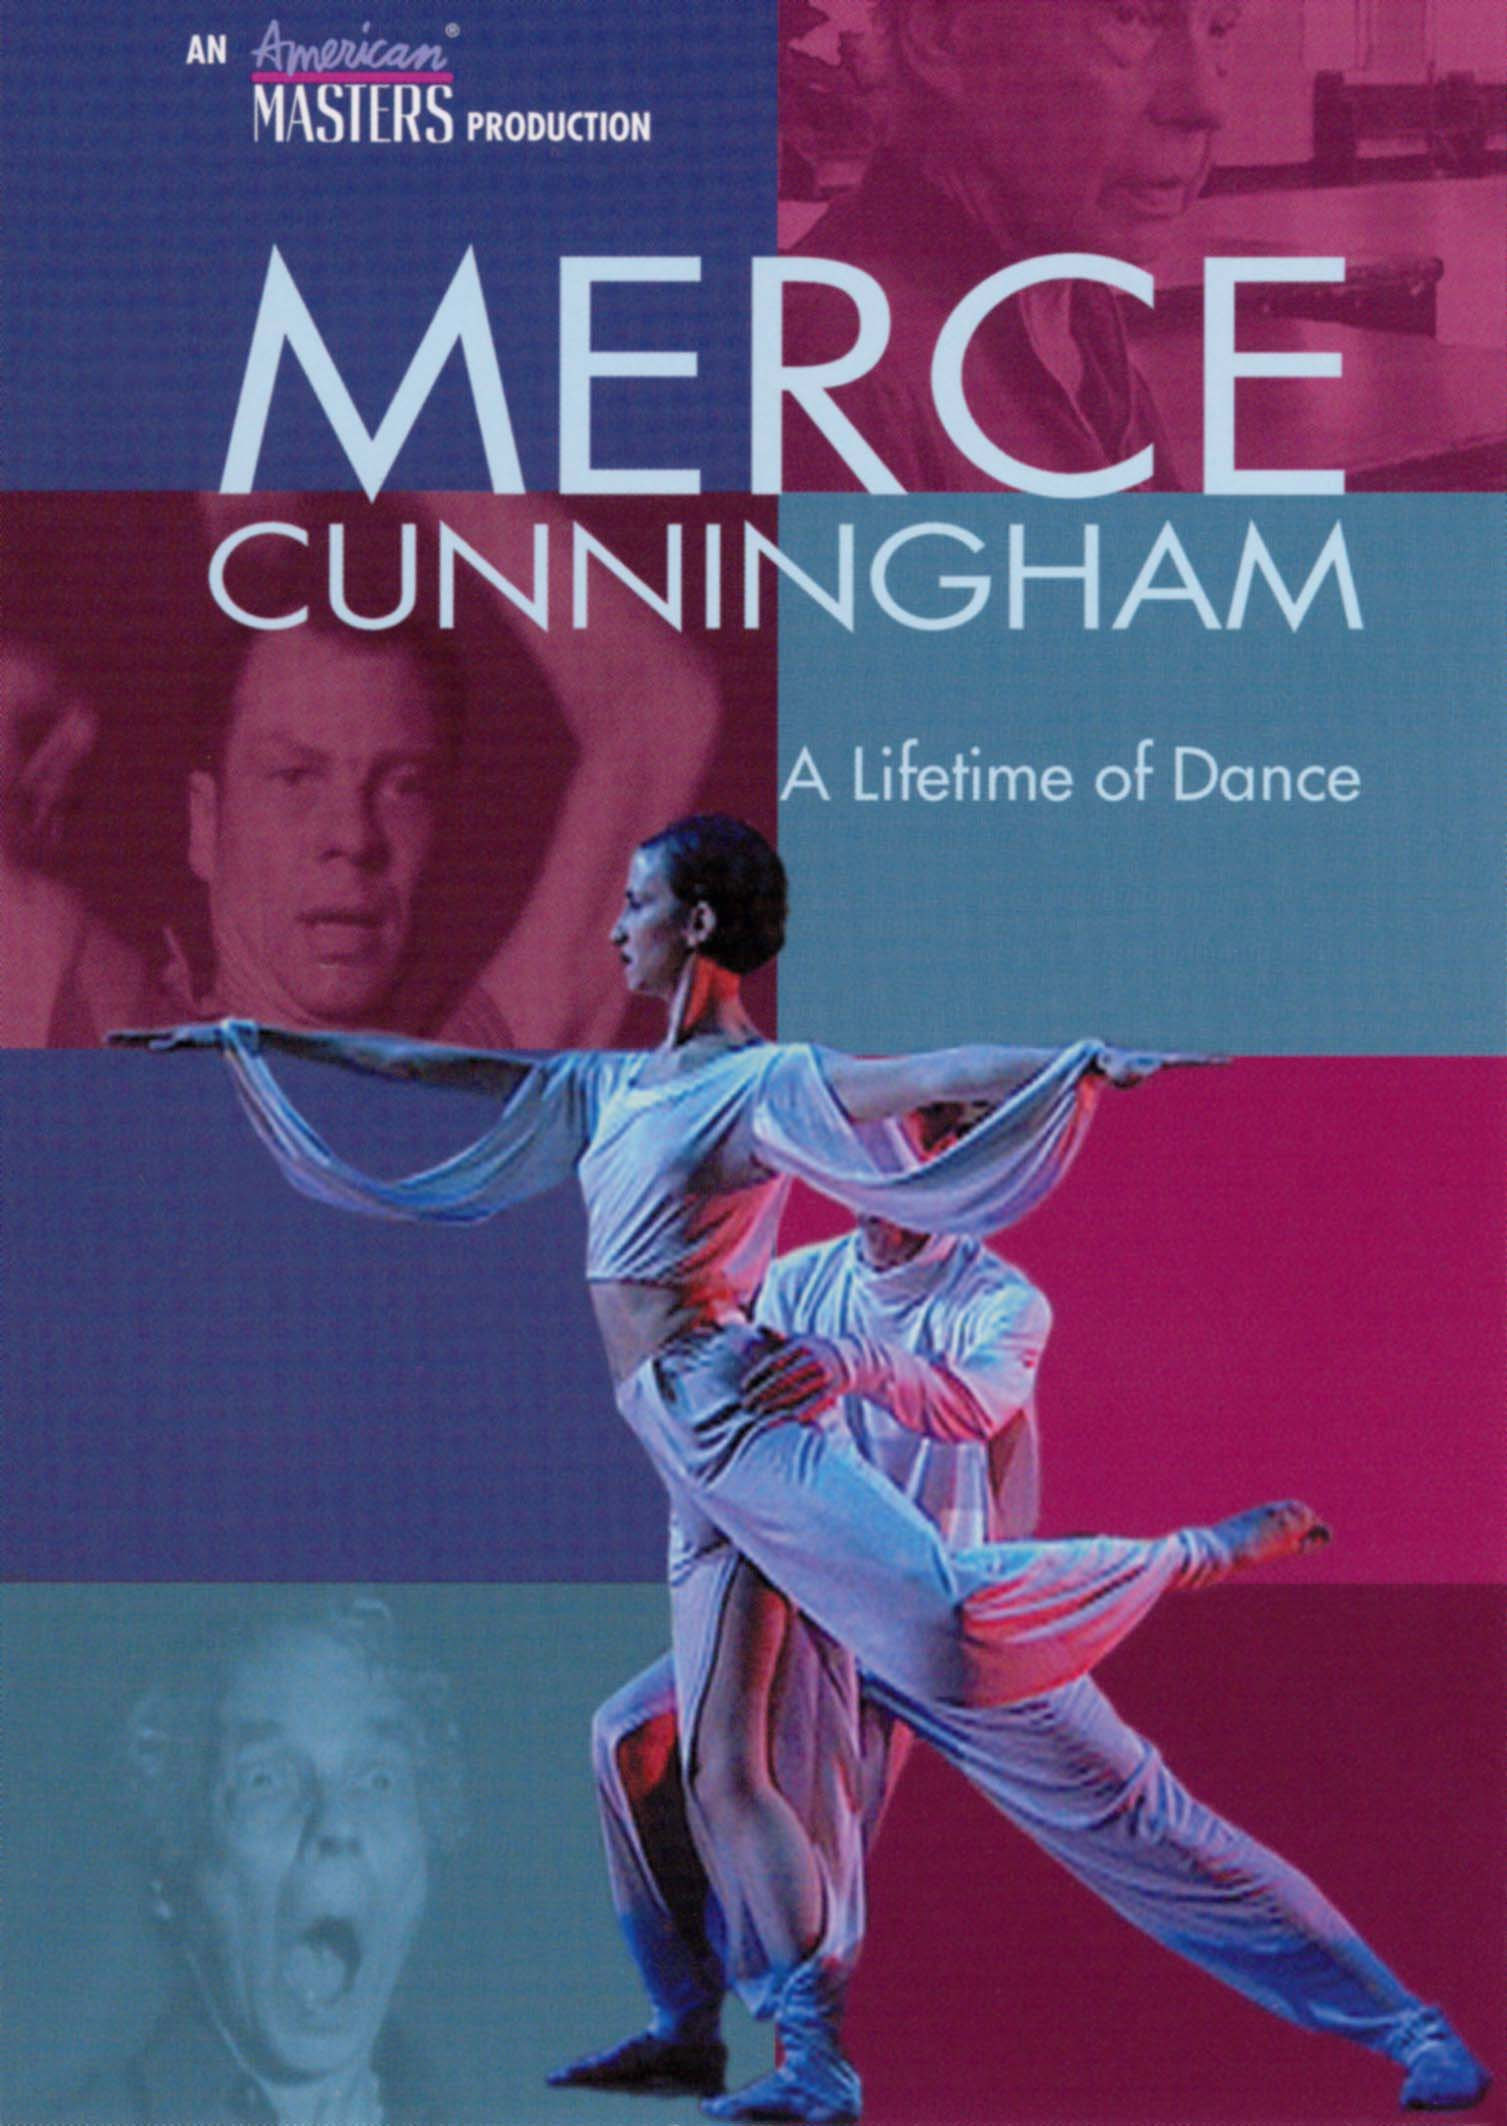 Merce Cunningham, the man who changed dance